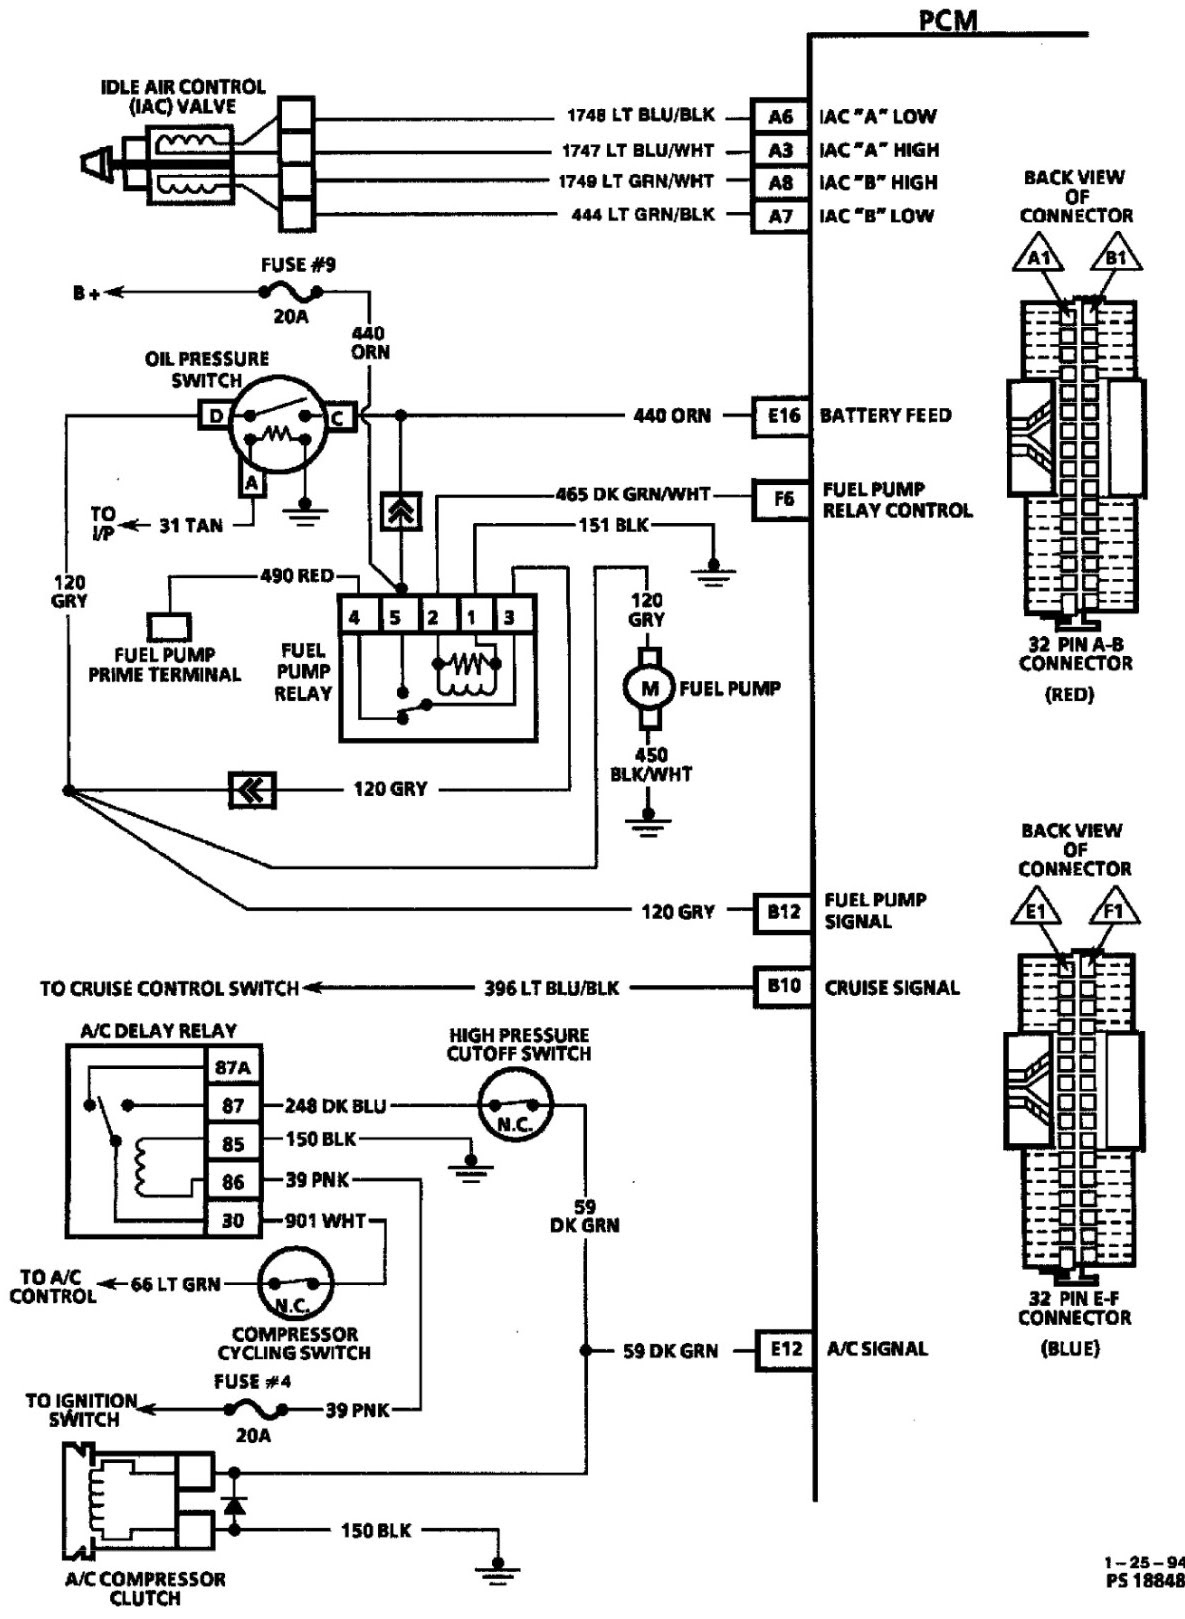 97 Chevy Blazer Fuel Pump Wiring Diagram 2000 Wiring Diagram System Rock Norm A Rock Norm A Ediliadesign It